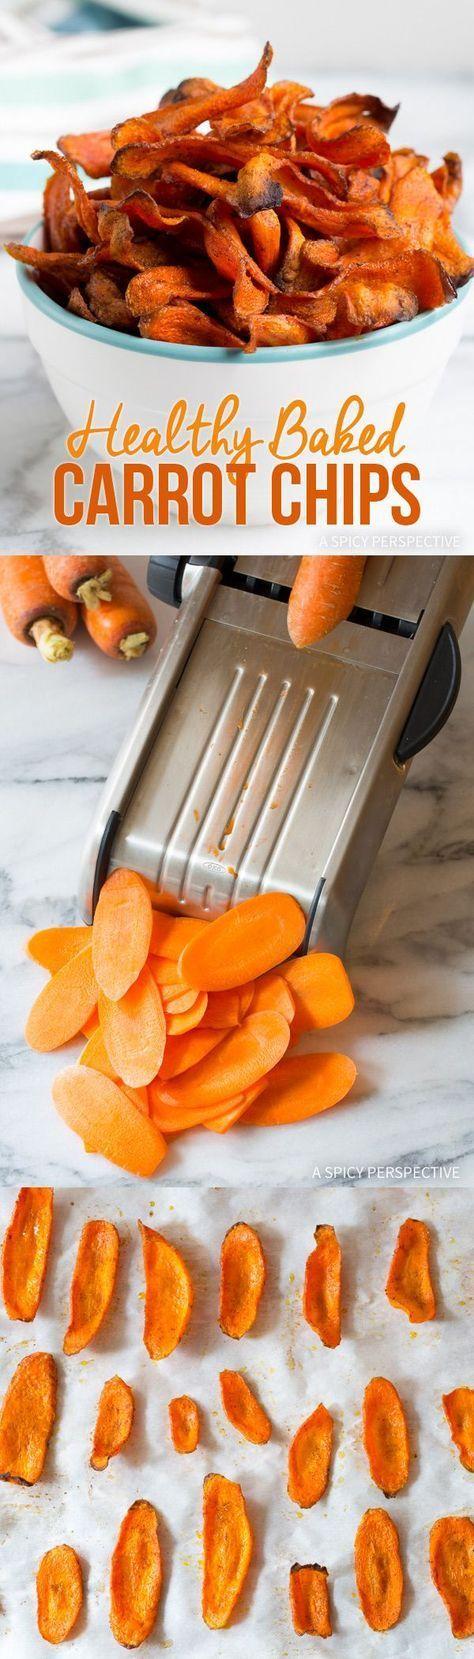 Crisp Healthy Baked Carrot Chips Recipe